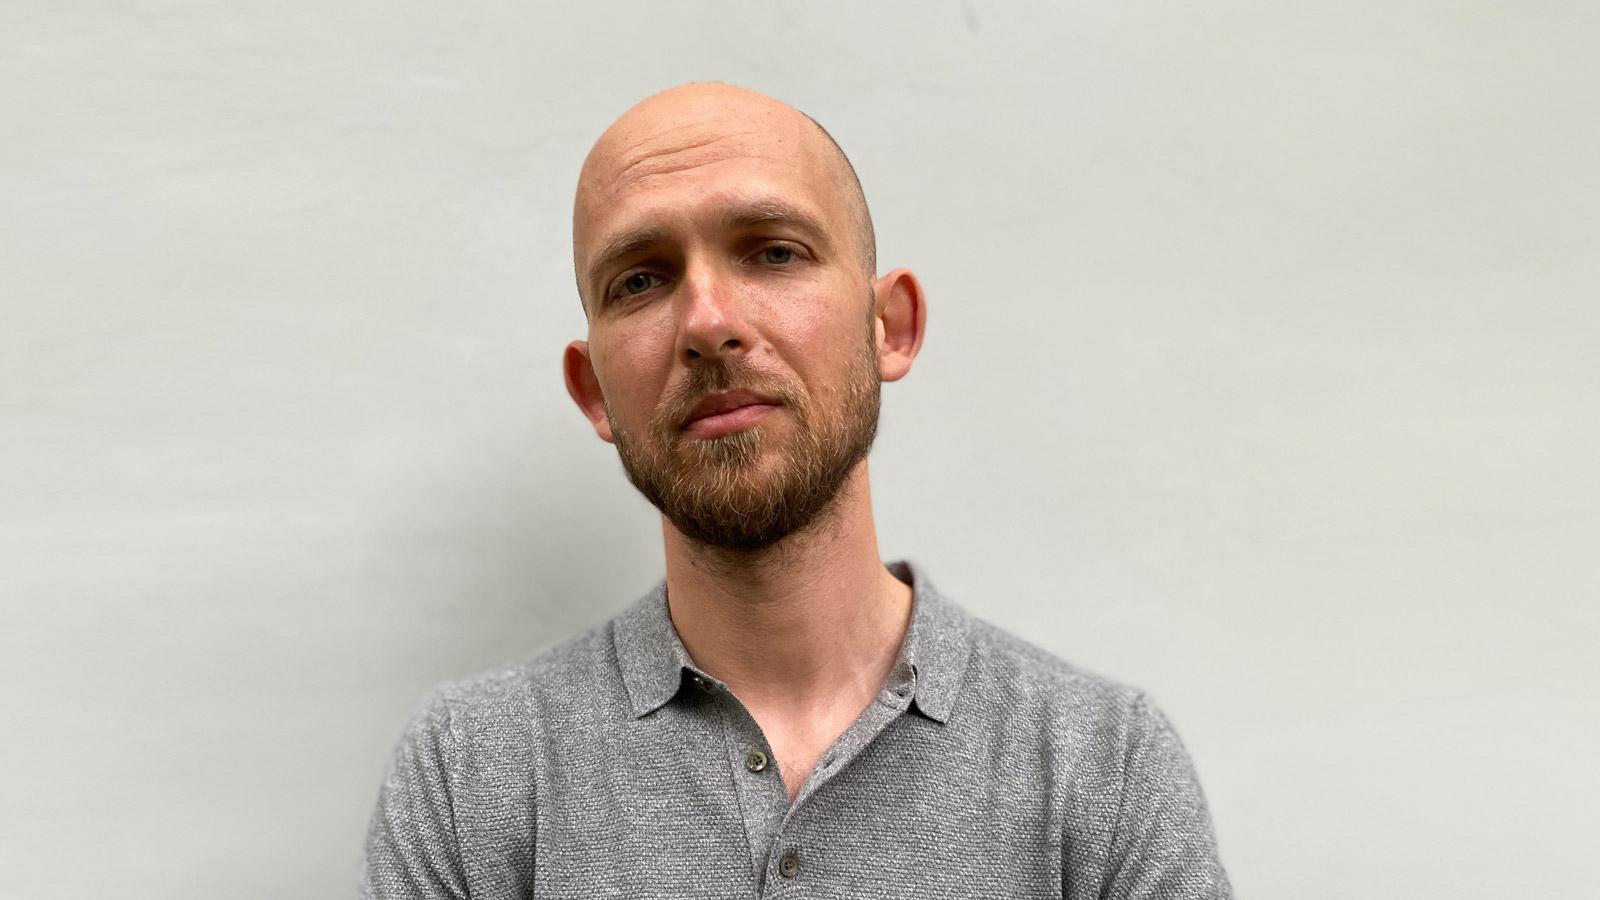 Nowy Digital Strategy Director w Havas Media Group Havas Media mediarun HMG Filip Beźnicki havas media 2020